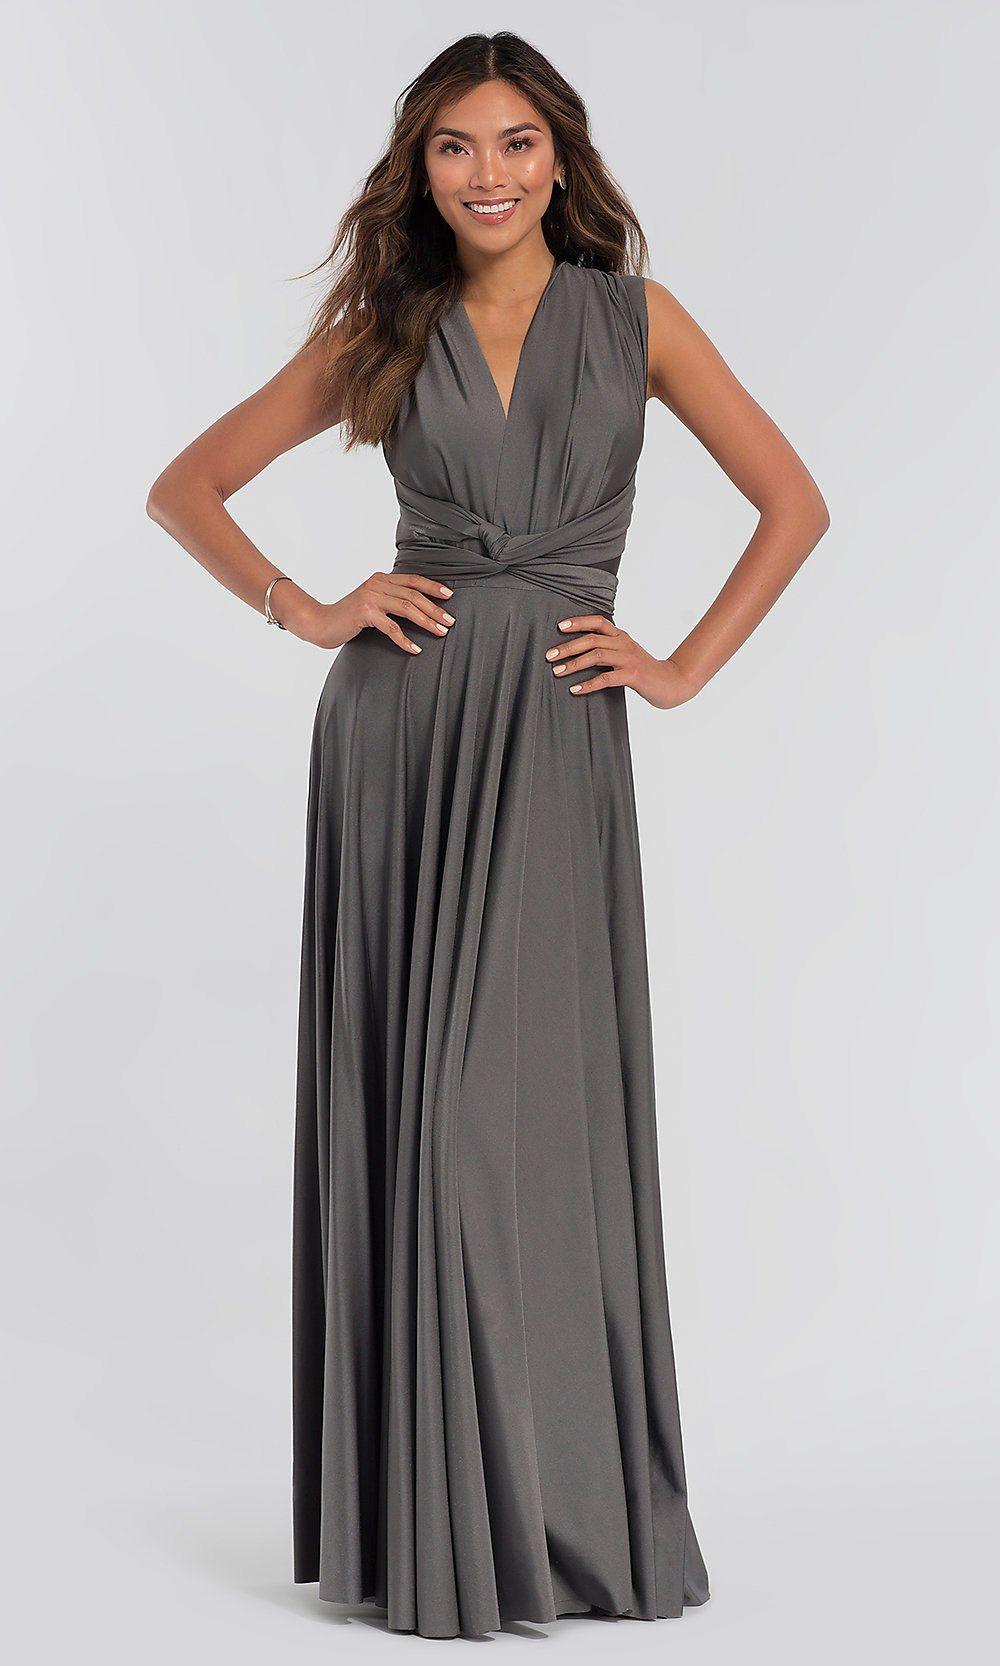 Long kleinfeld bridesmaid convertiblebodice dress our